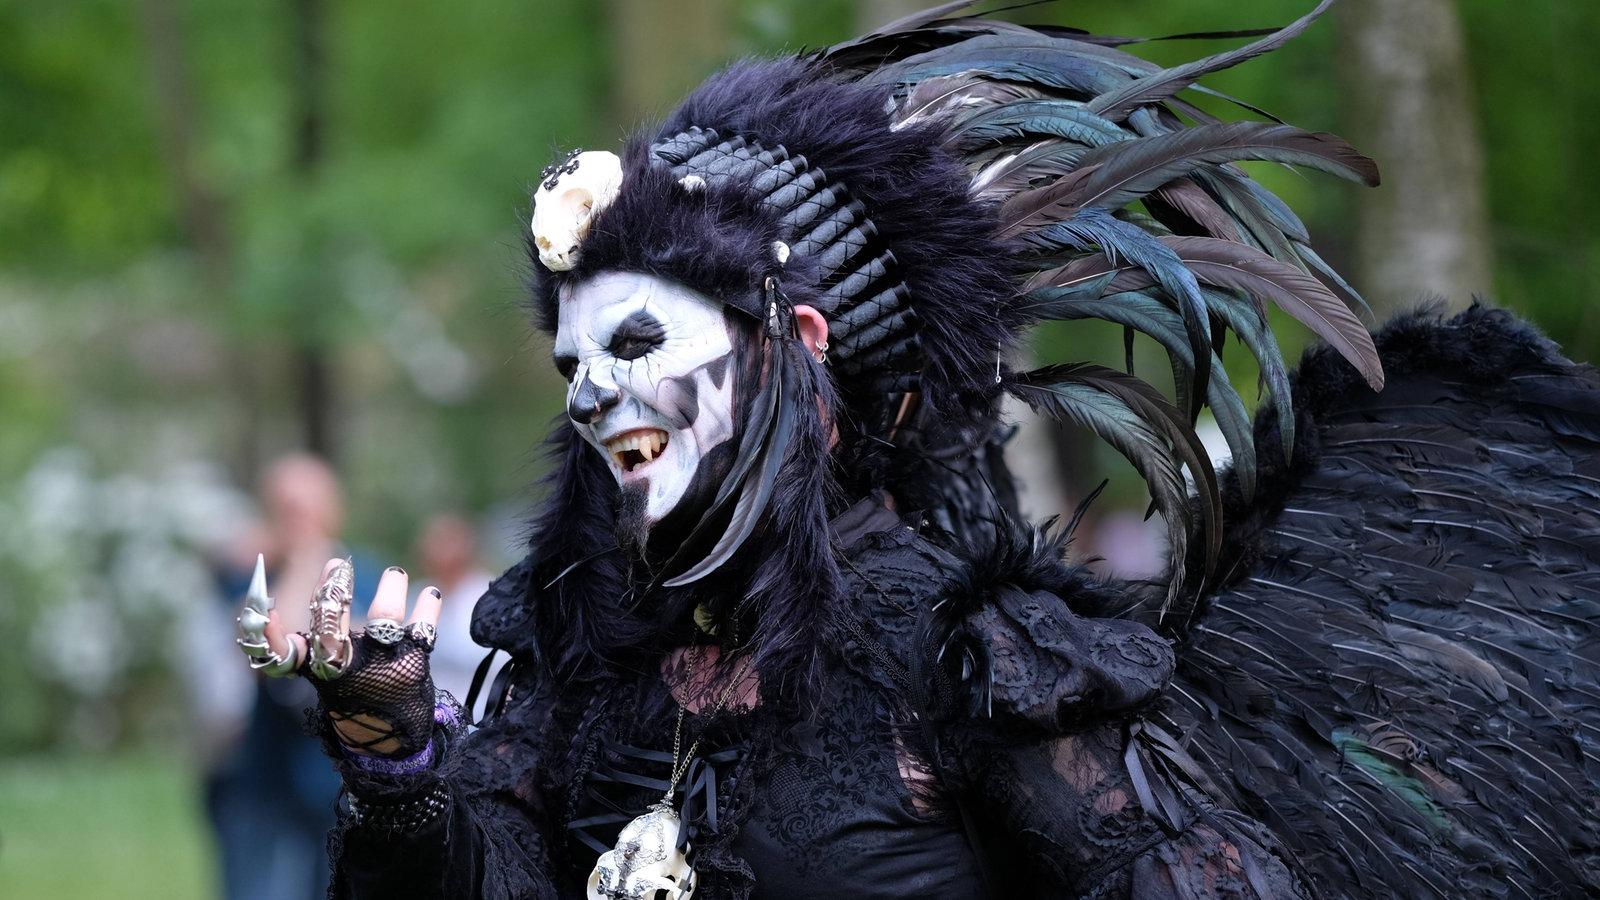 Makeup for halloween 2018